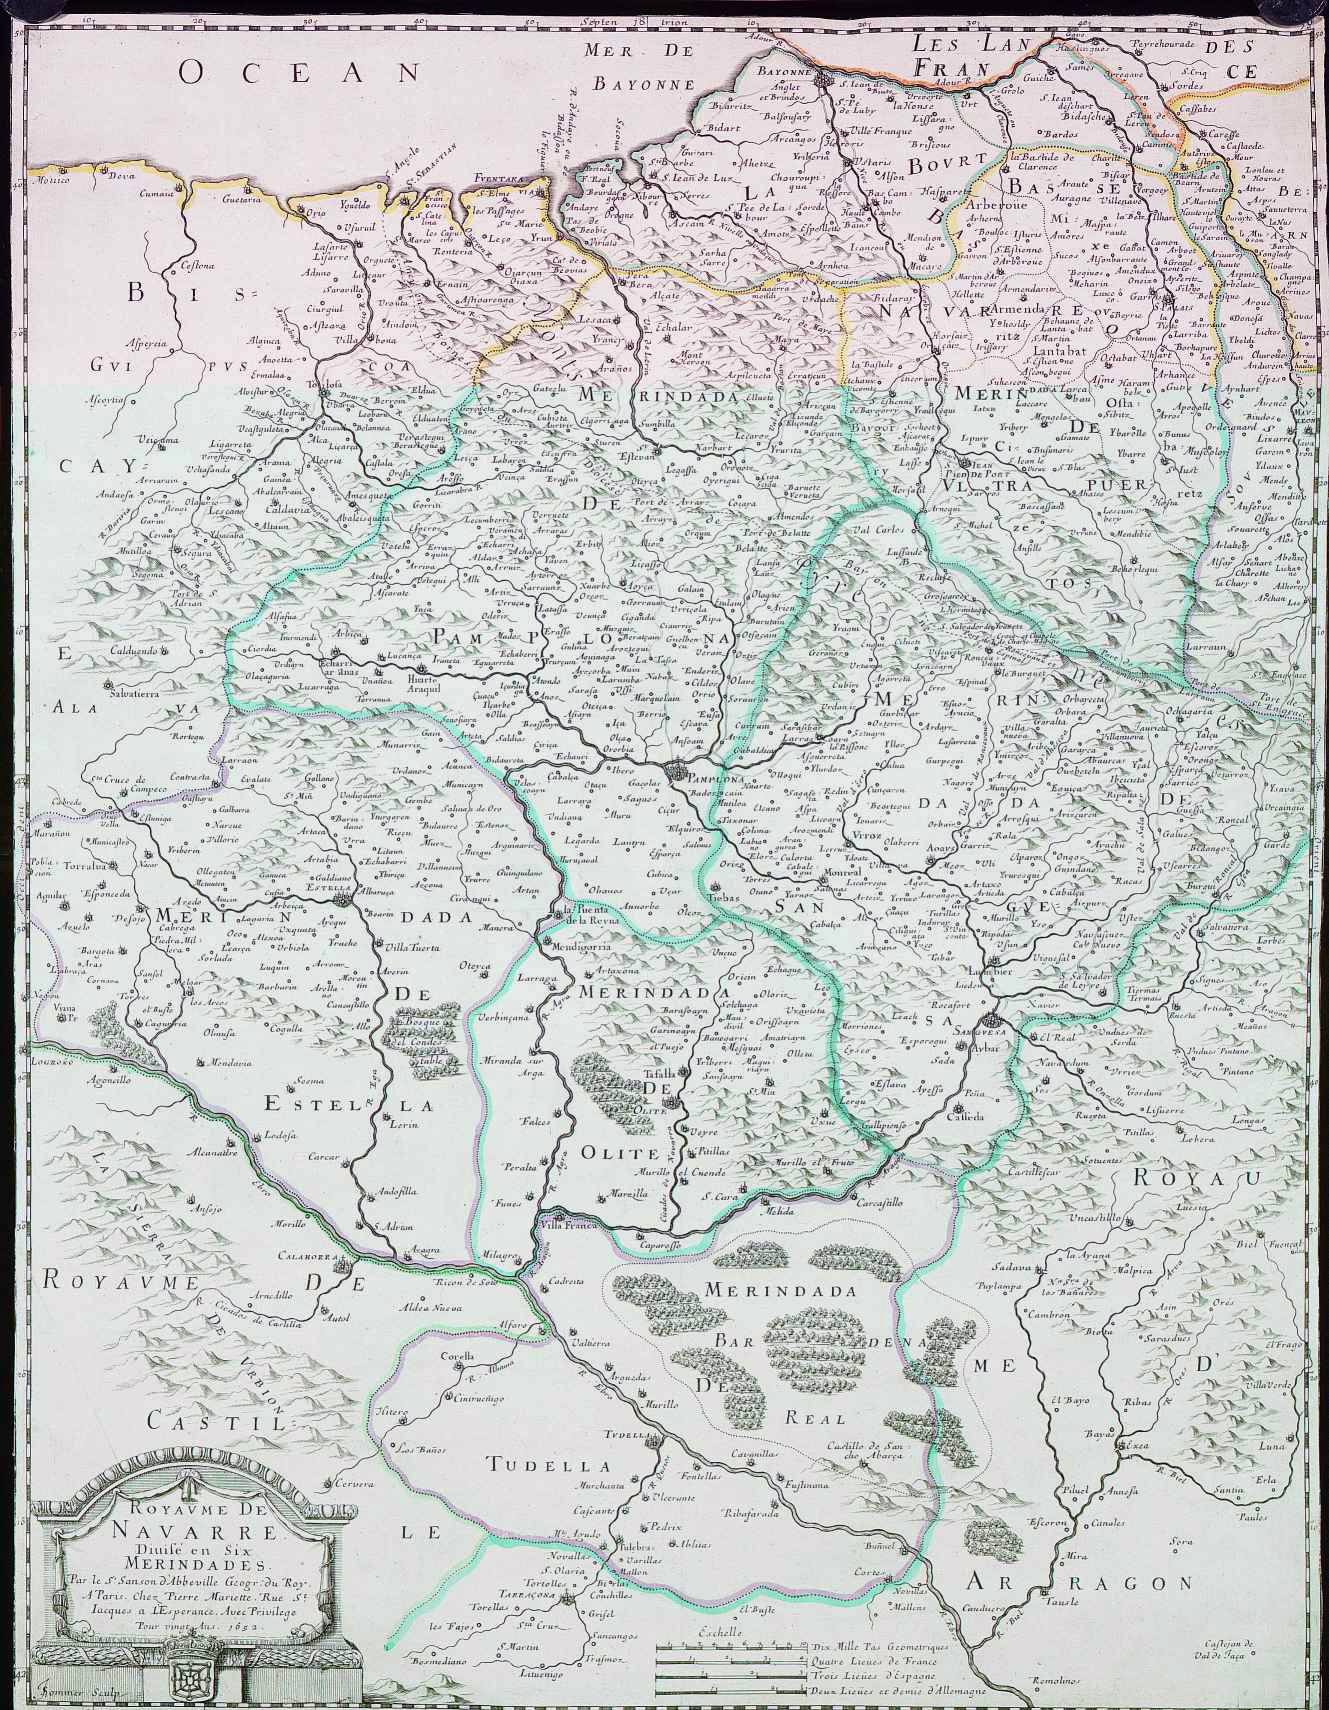 Kingdom of Navarre in six Merindades